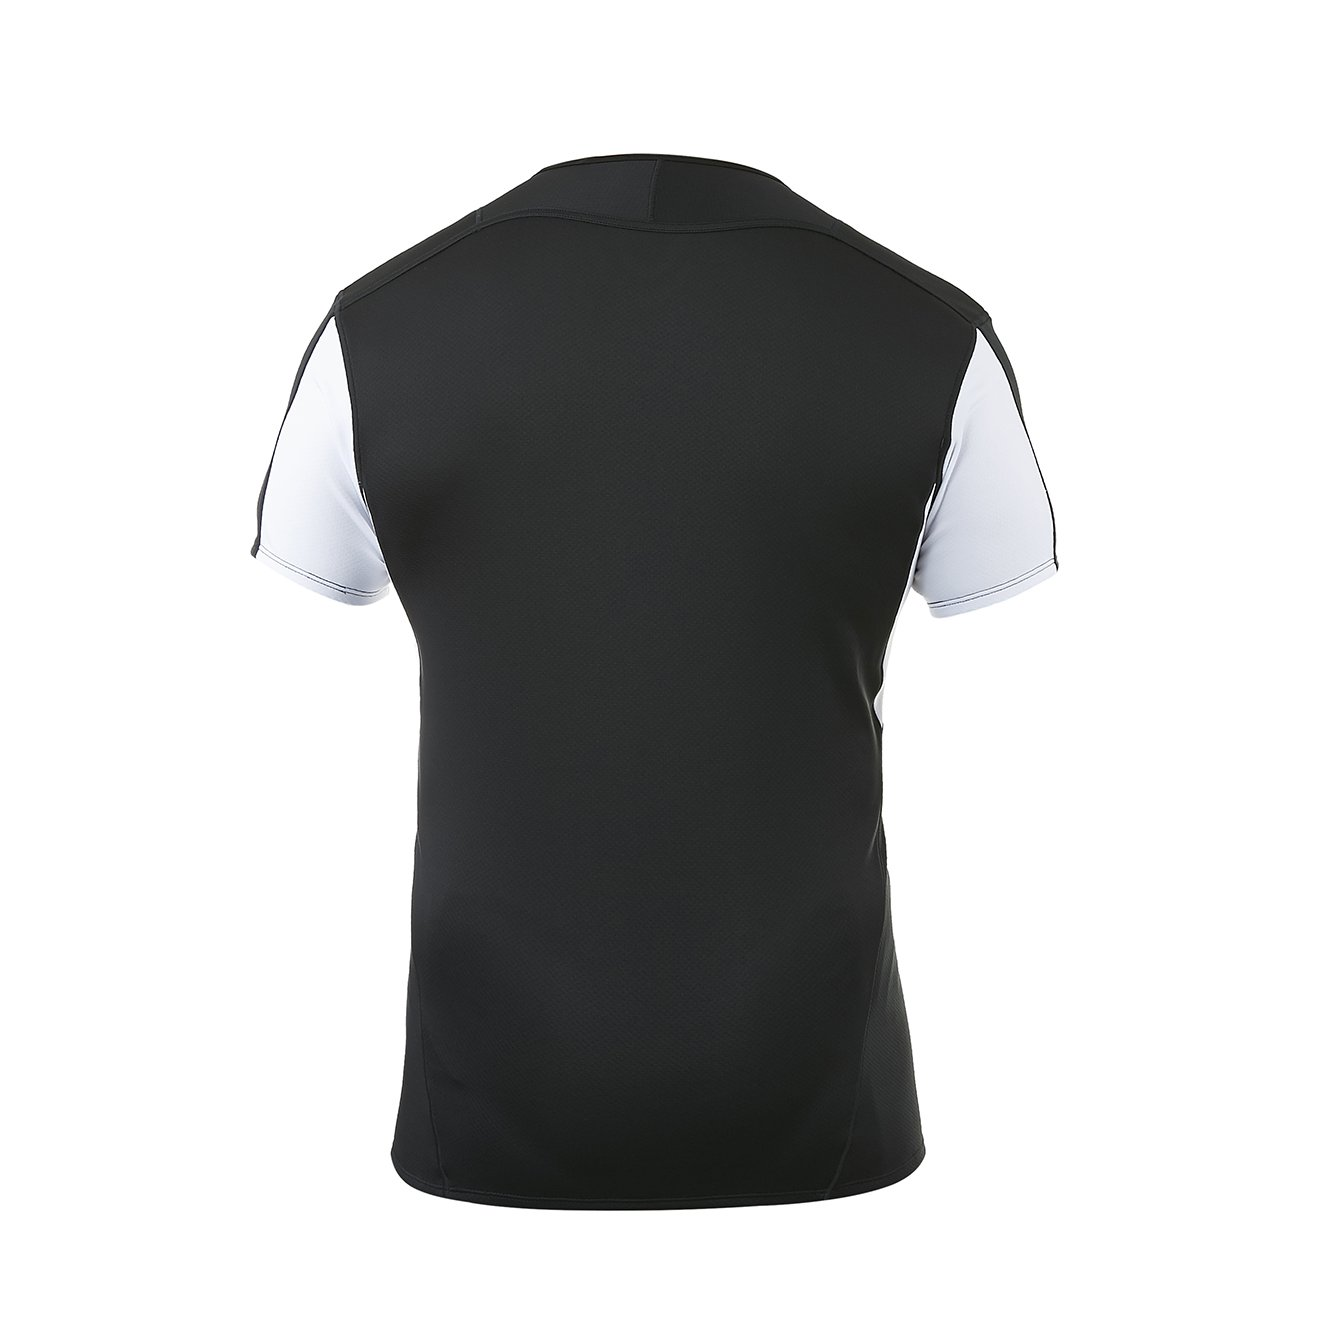 ab21aec6a75 Canterbury Men's Vapodri Challenge Hooped Jersey: Amazon.co.uk: Clothing